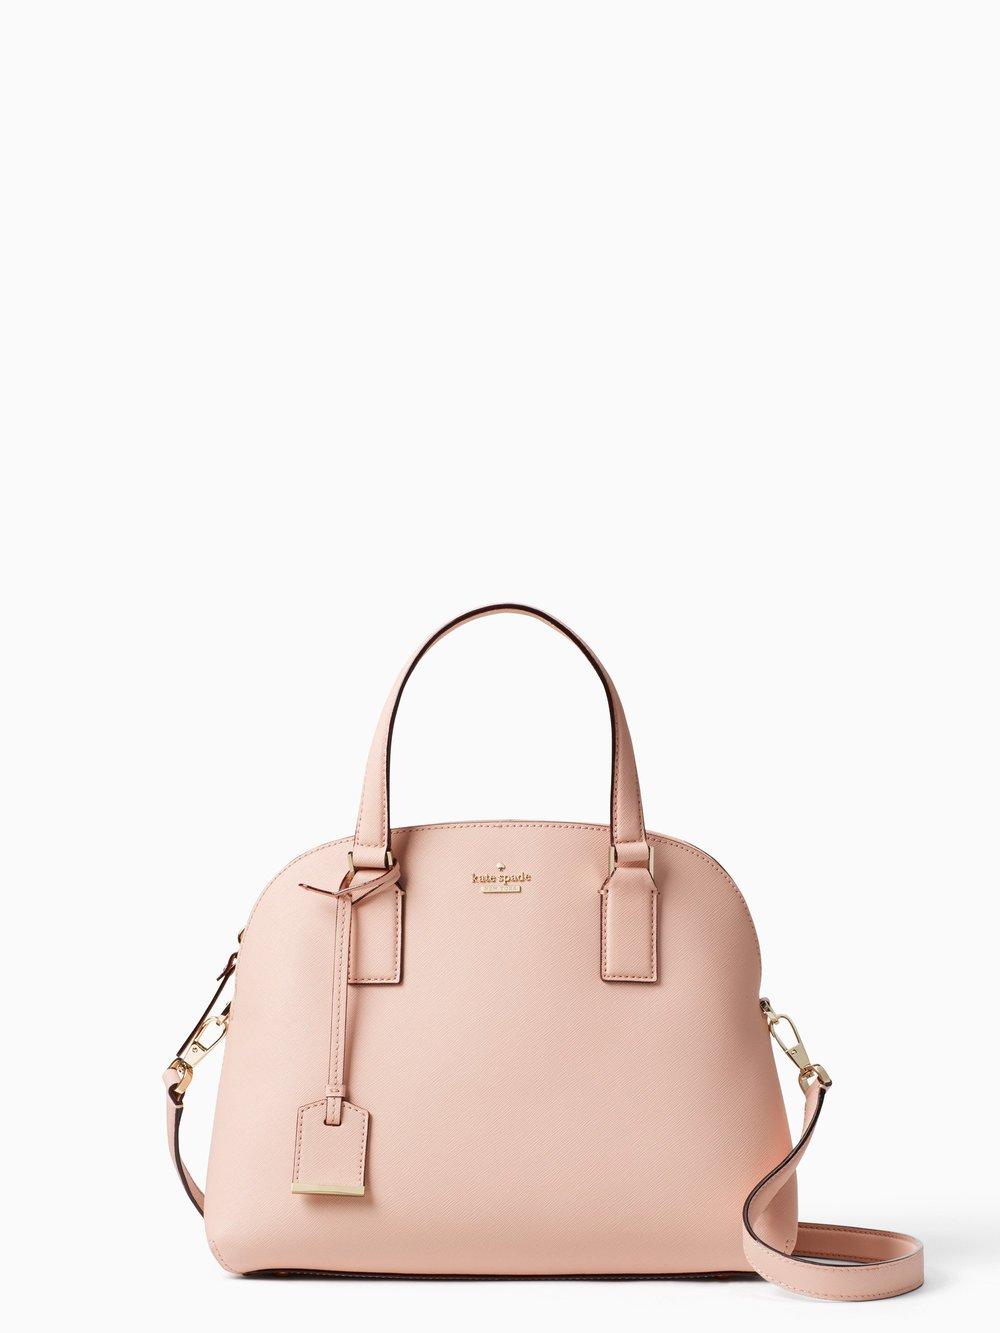 Kate Spade Pink handbag.jpg